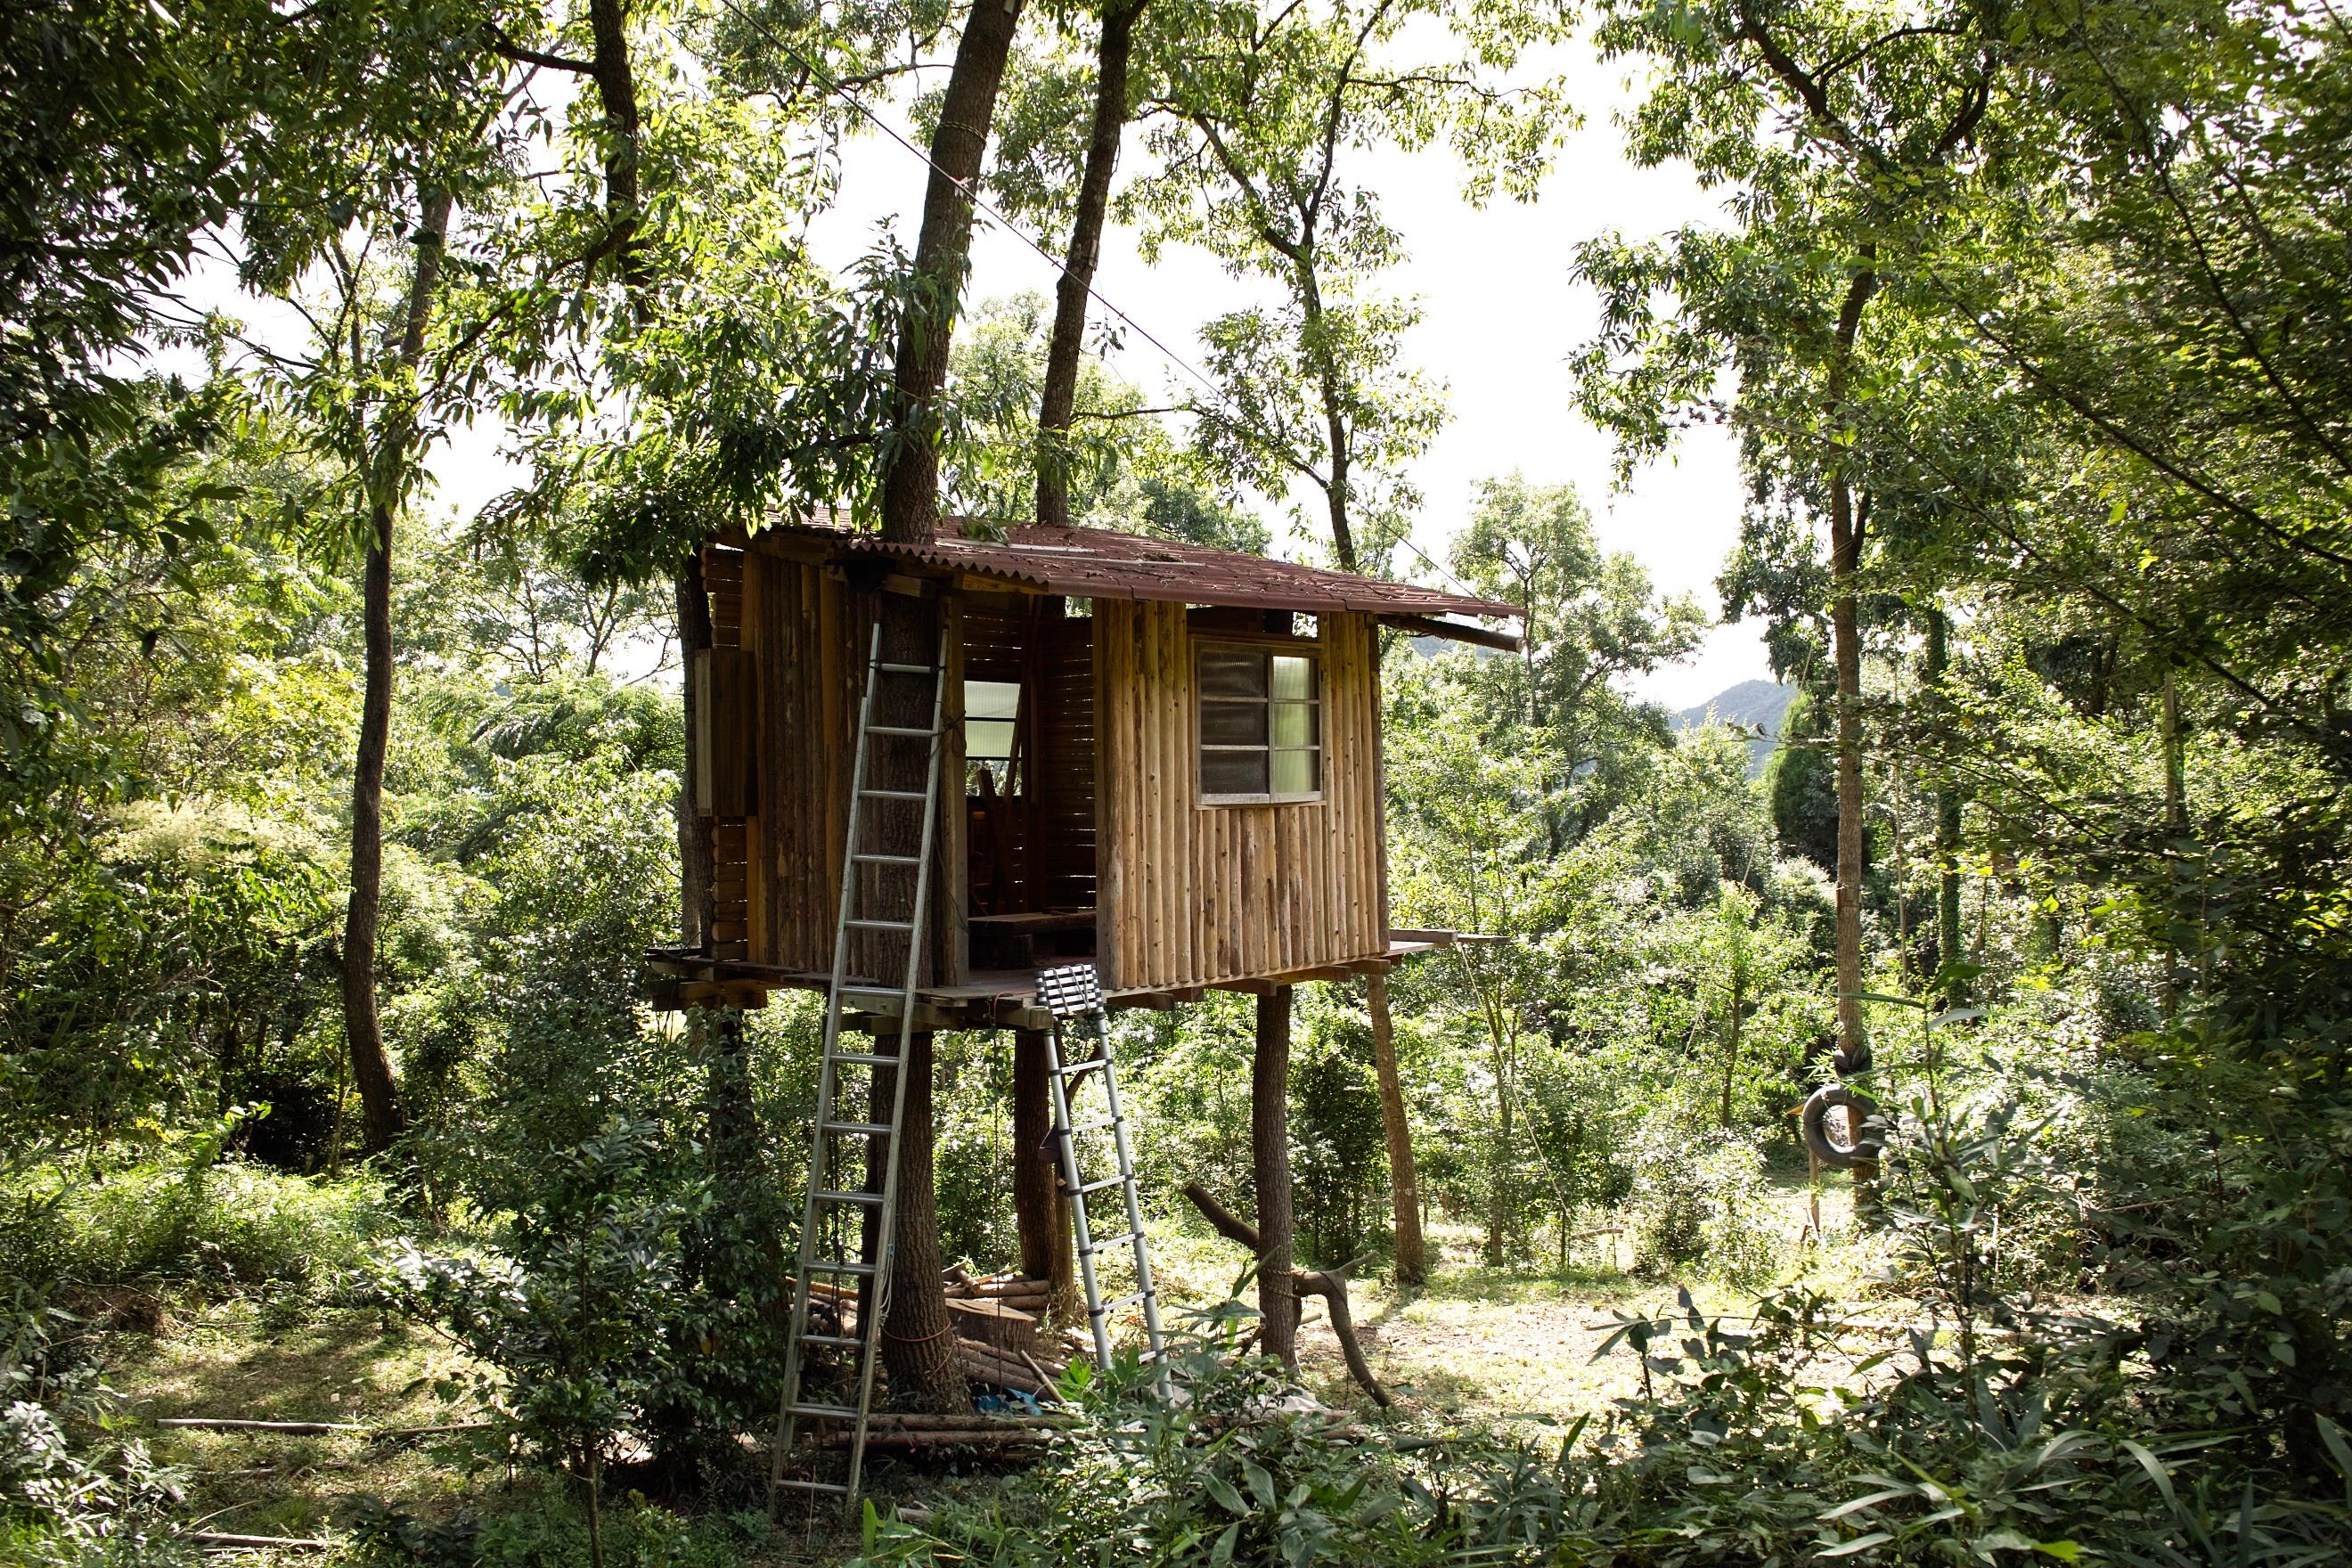 Fotos Gratis Bosque Sendero Choza Selva Cabana De Madera Casa - Cabaas-de-madera-en-arboles